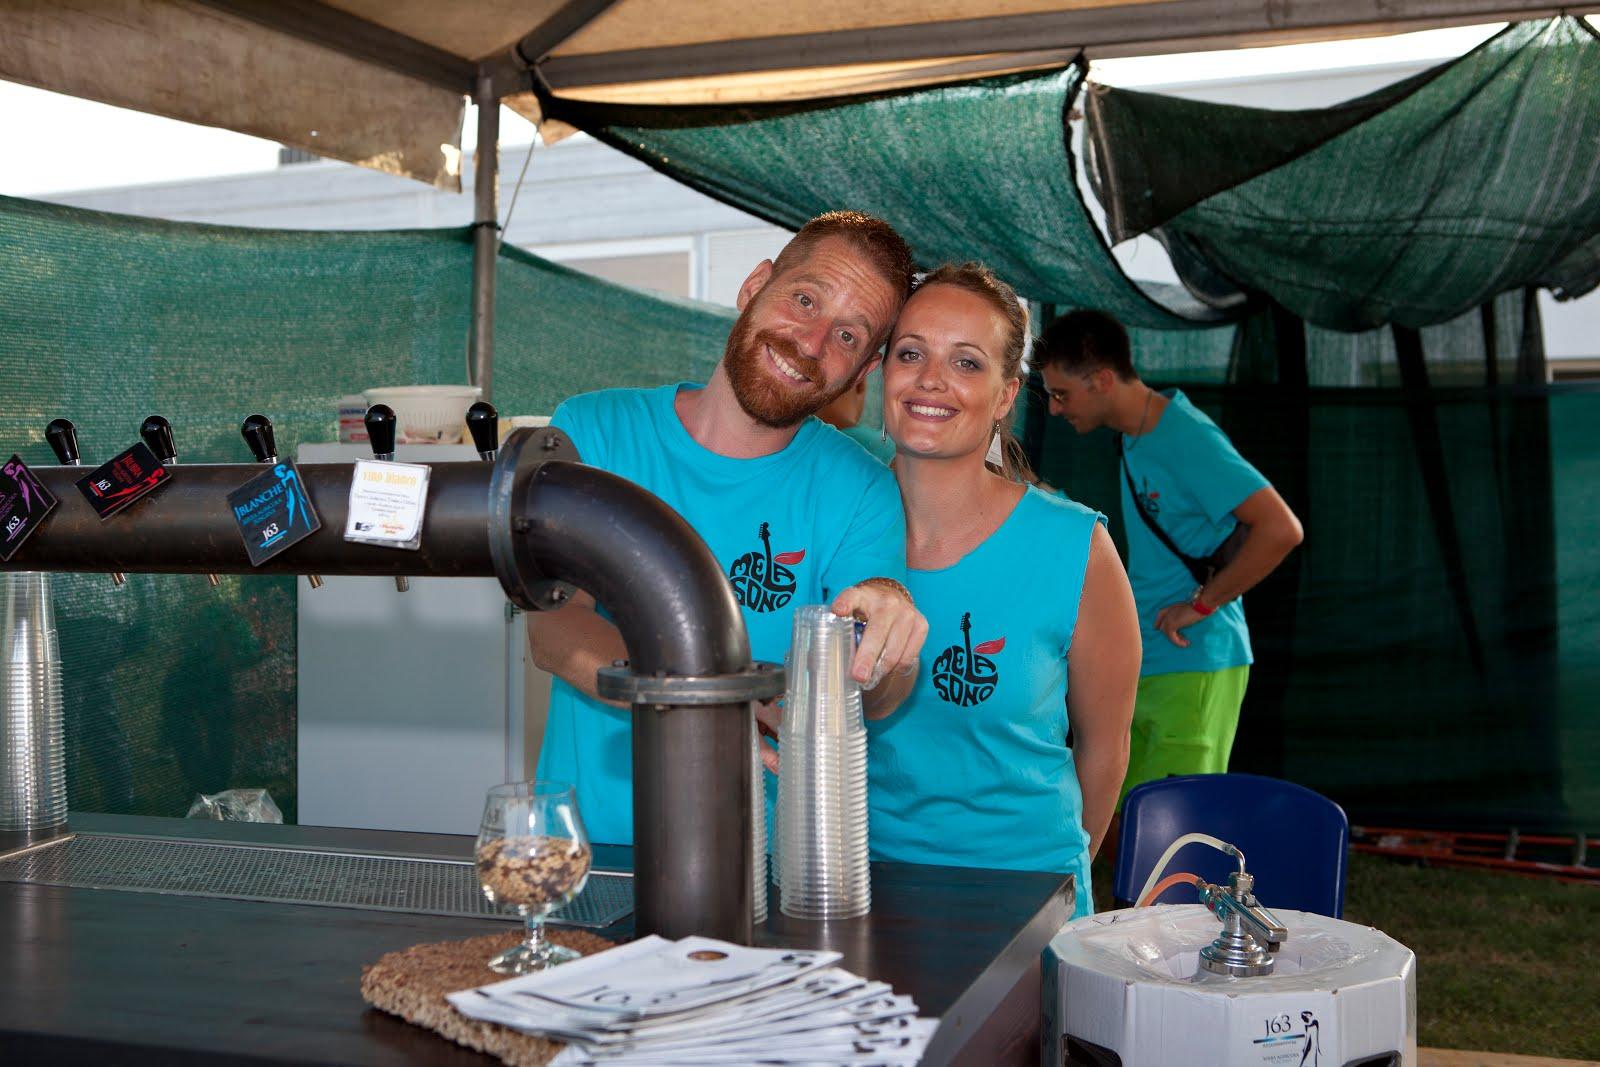 Birreria, paninoteca ed area pub al #MelaSòno16 - Photogallery